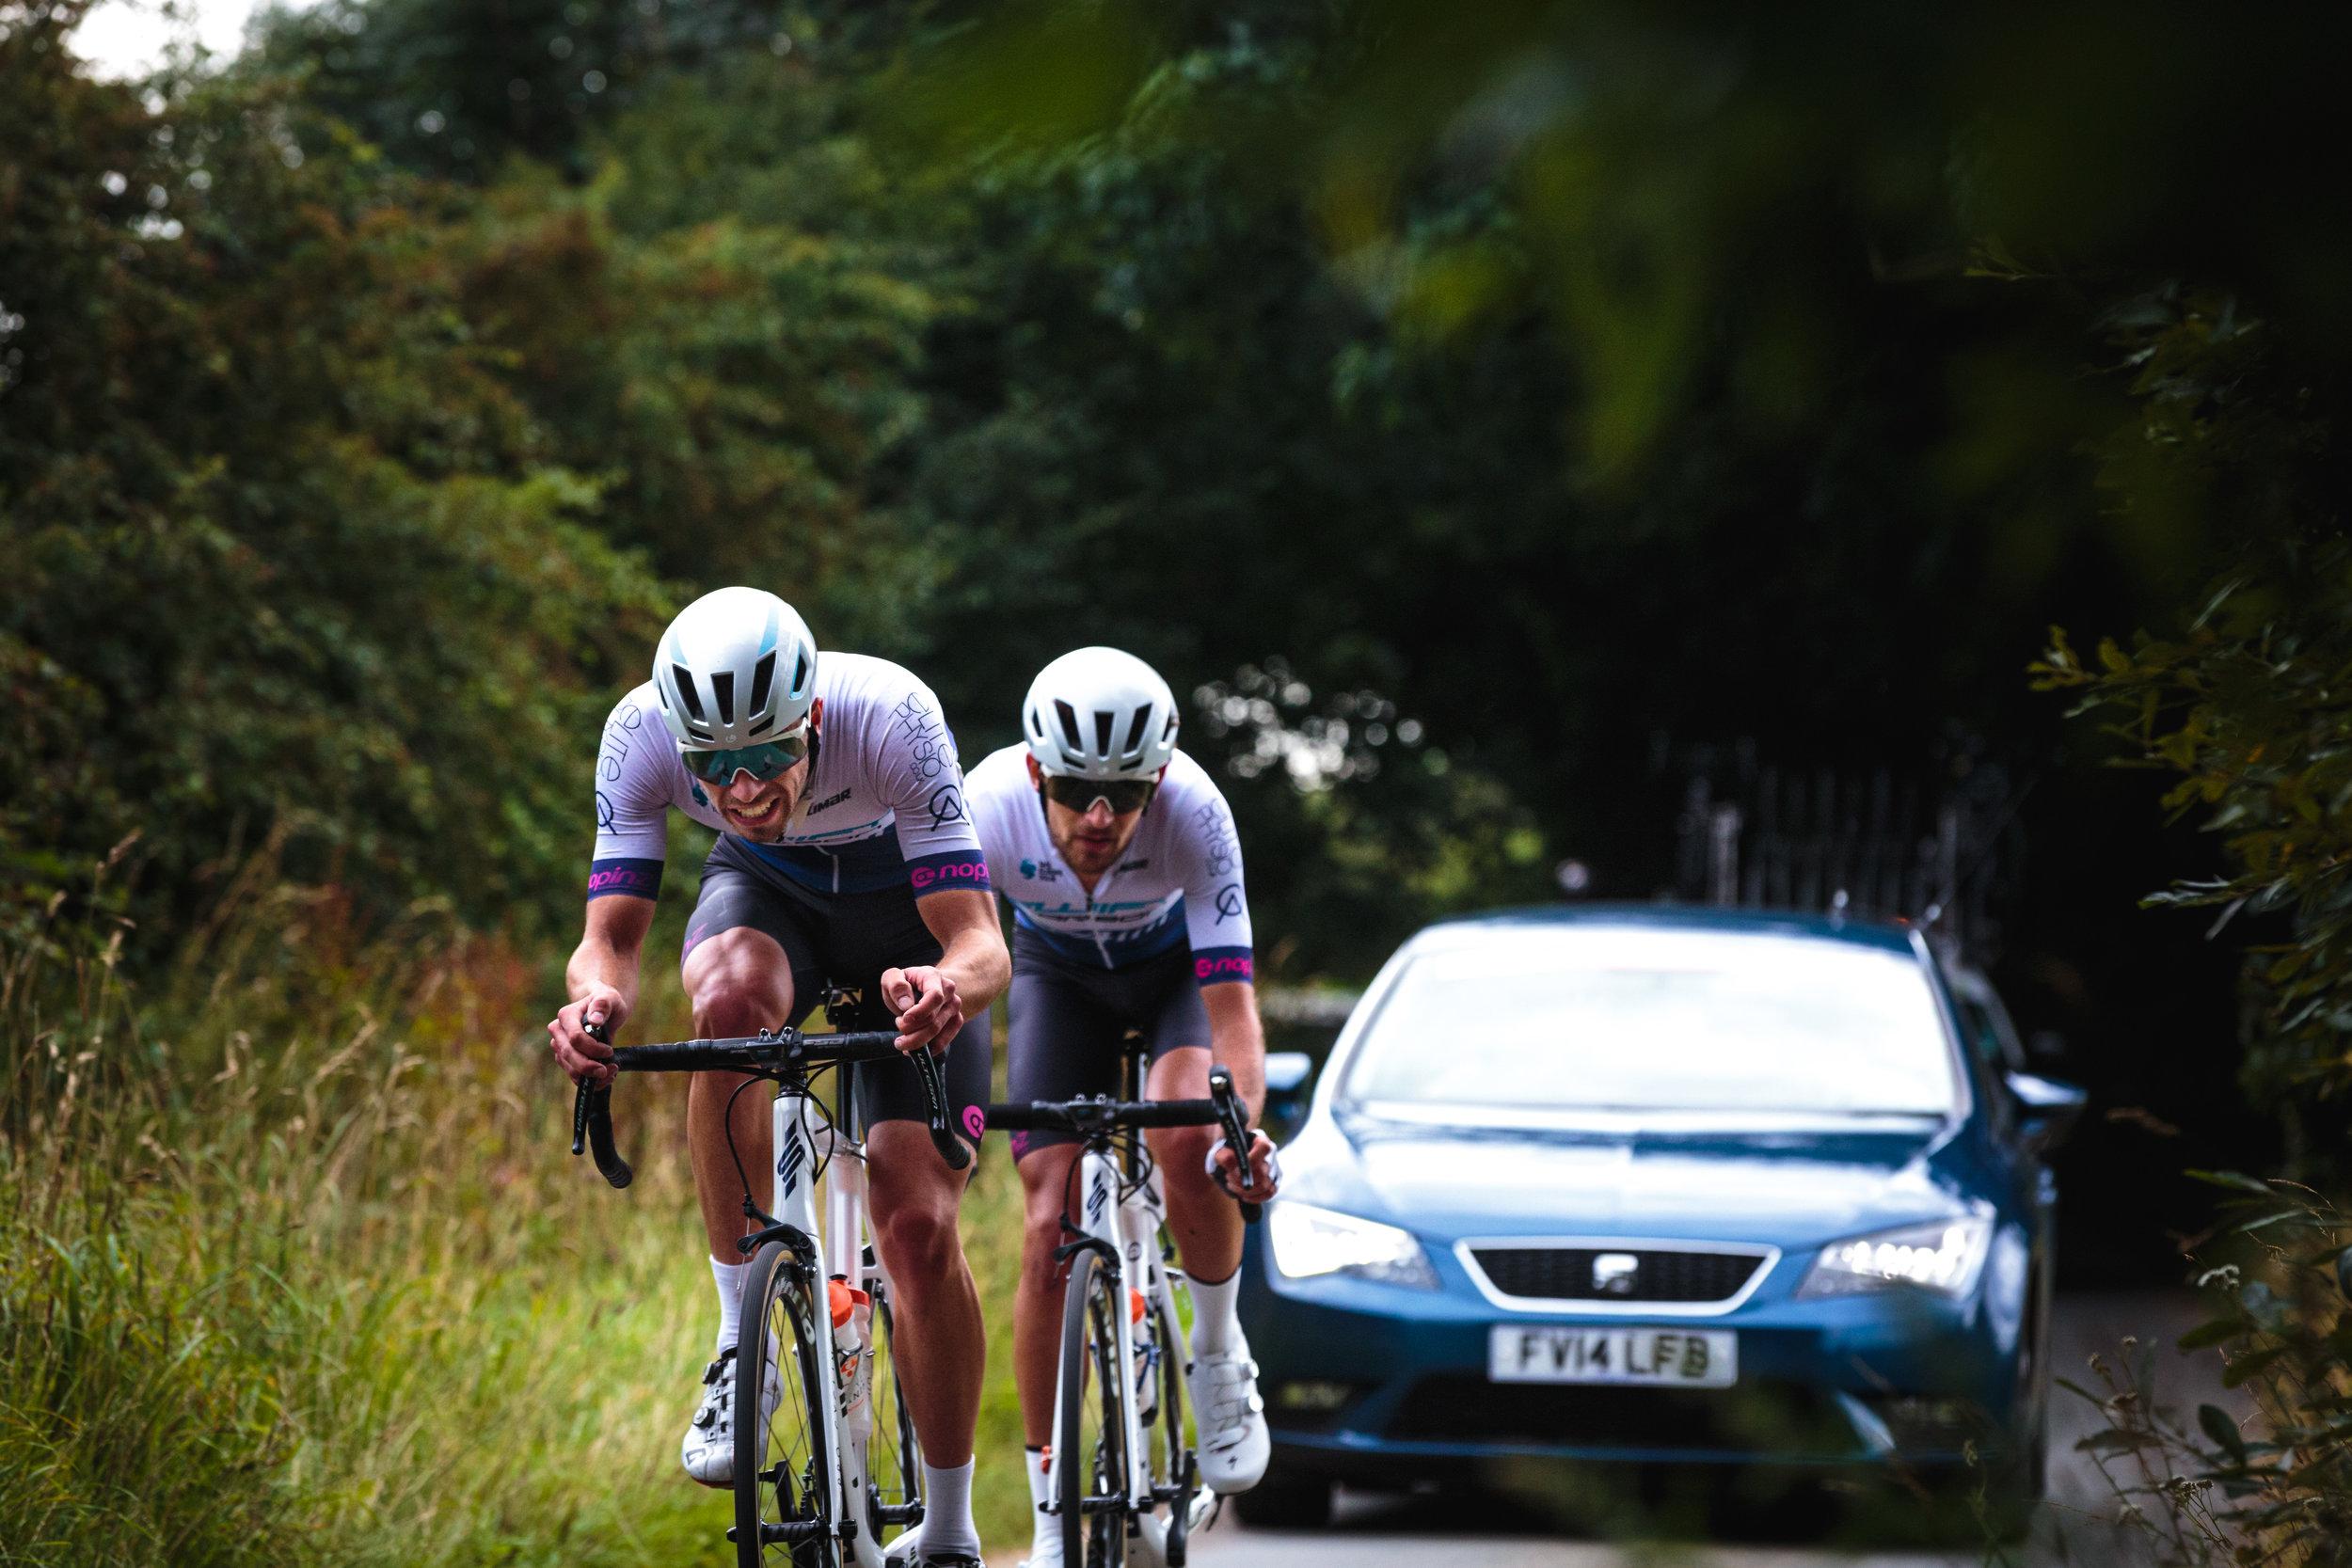 The Dream Team: James Shaw & Jacob Scott of Swift Pro Racing